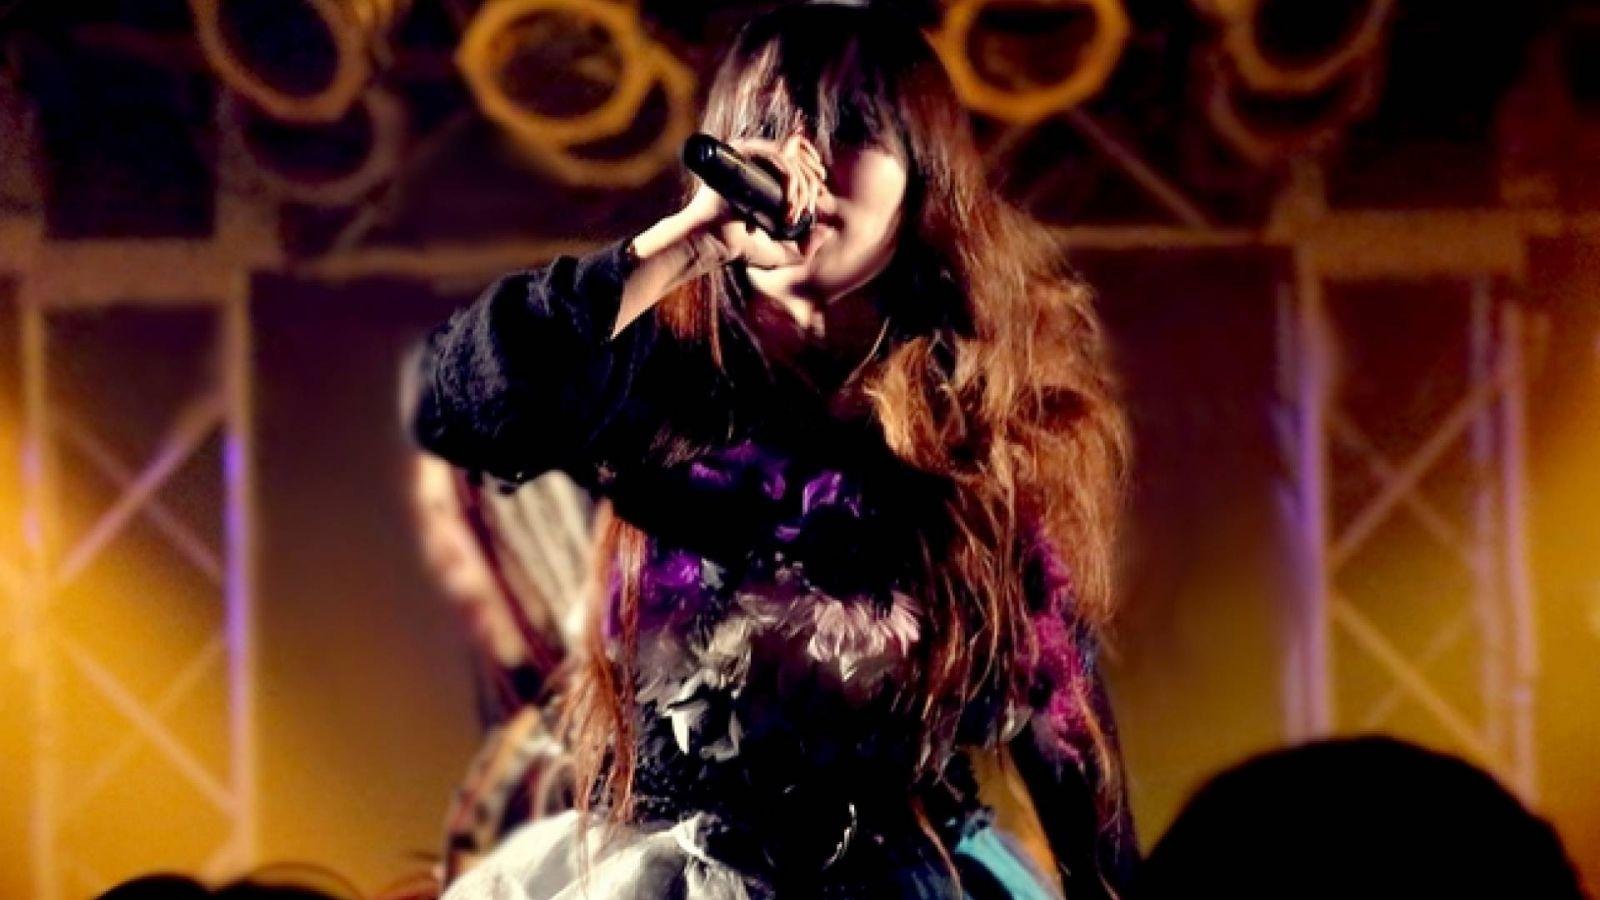 SoundWitch ao vivo no Kichijoji © Soundwitch - Anastasia Jallais